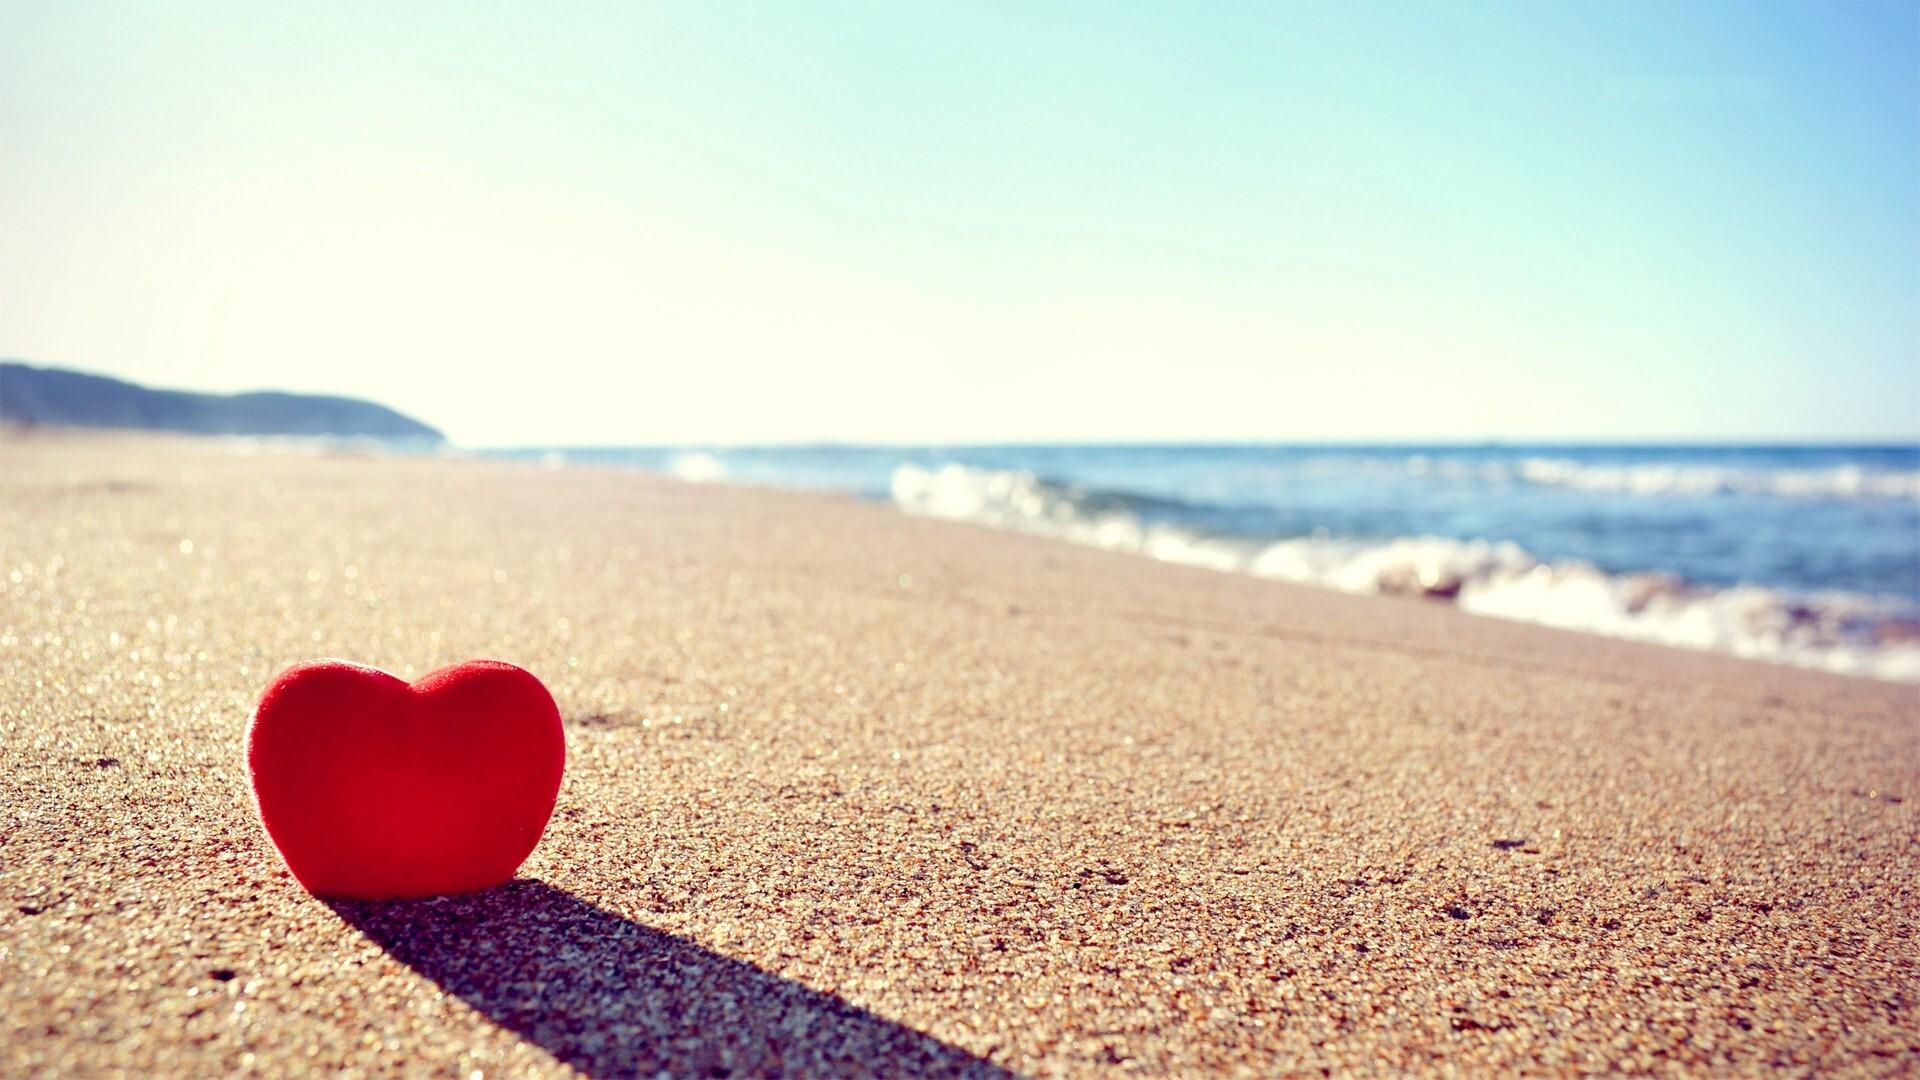 Love heart on beach hd photo background hd wallpapers - Love wallpaper hd ...